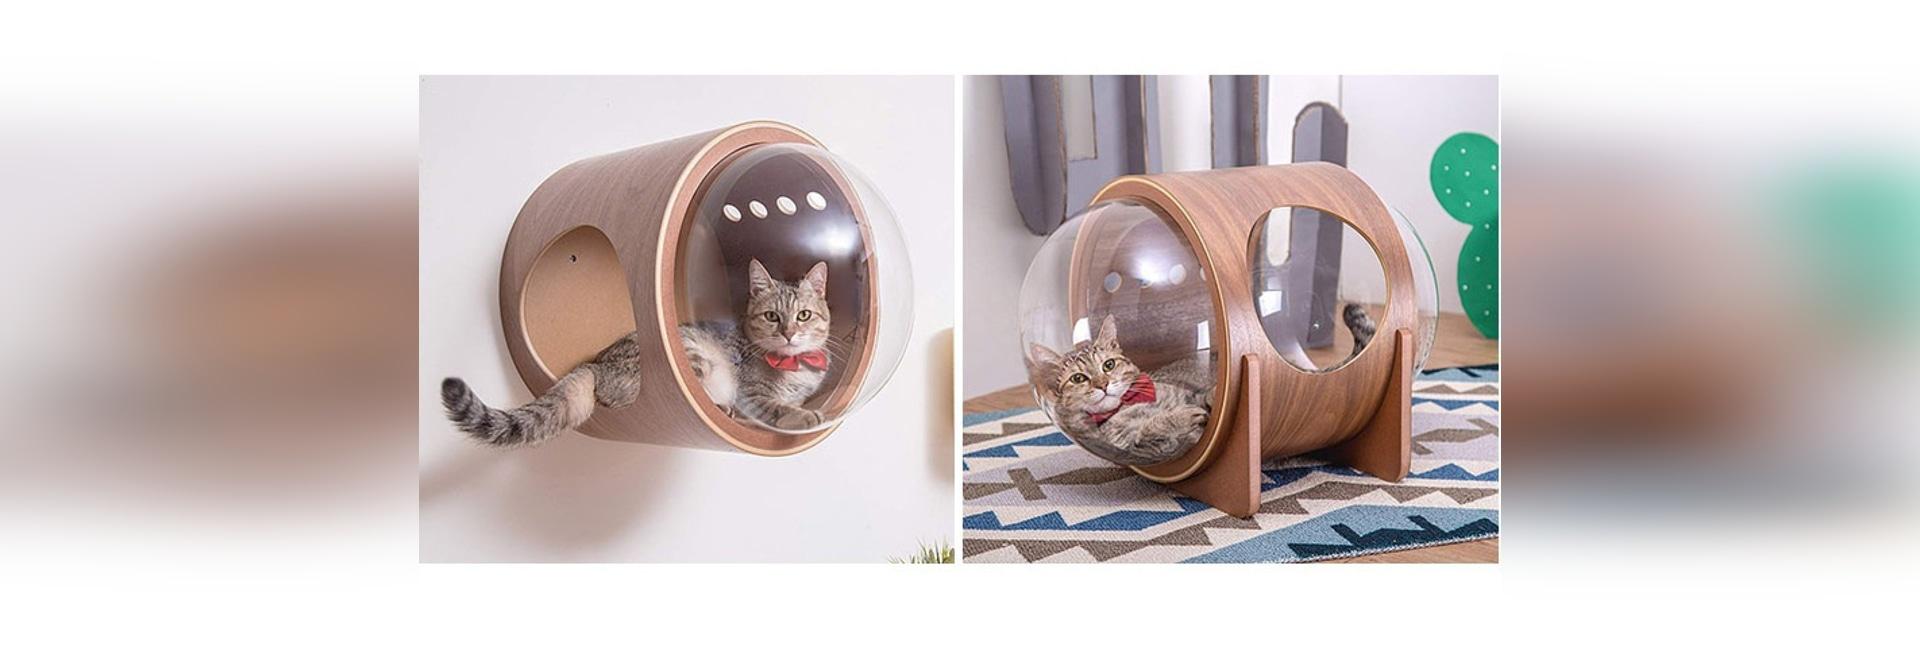 Raumschiff spornte Sache Cat Beds Ares A jetzt an